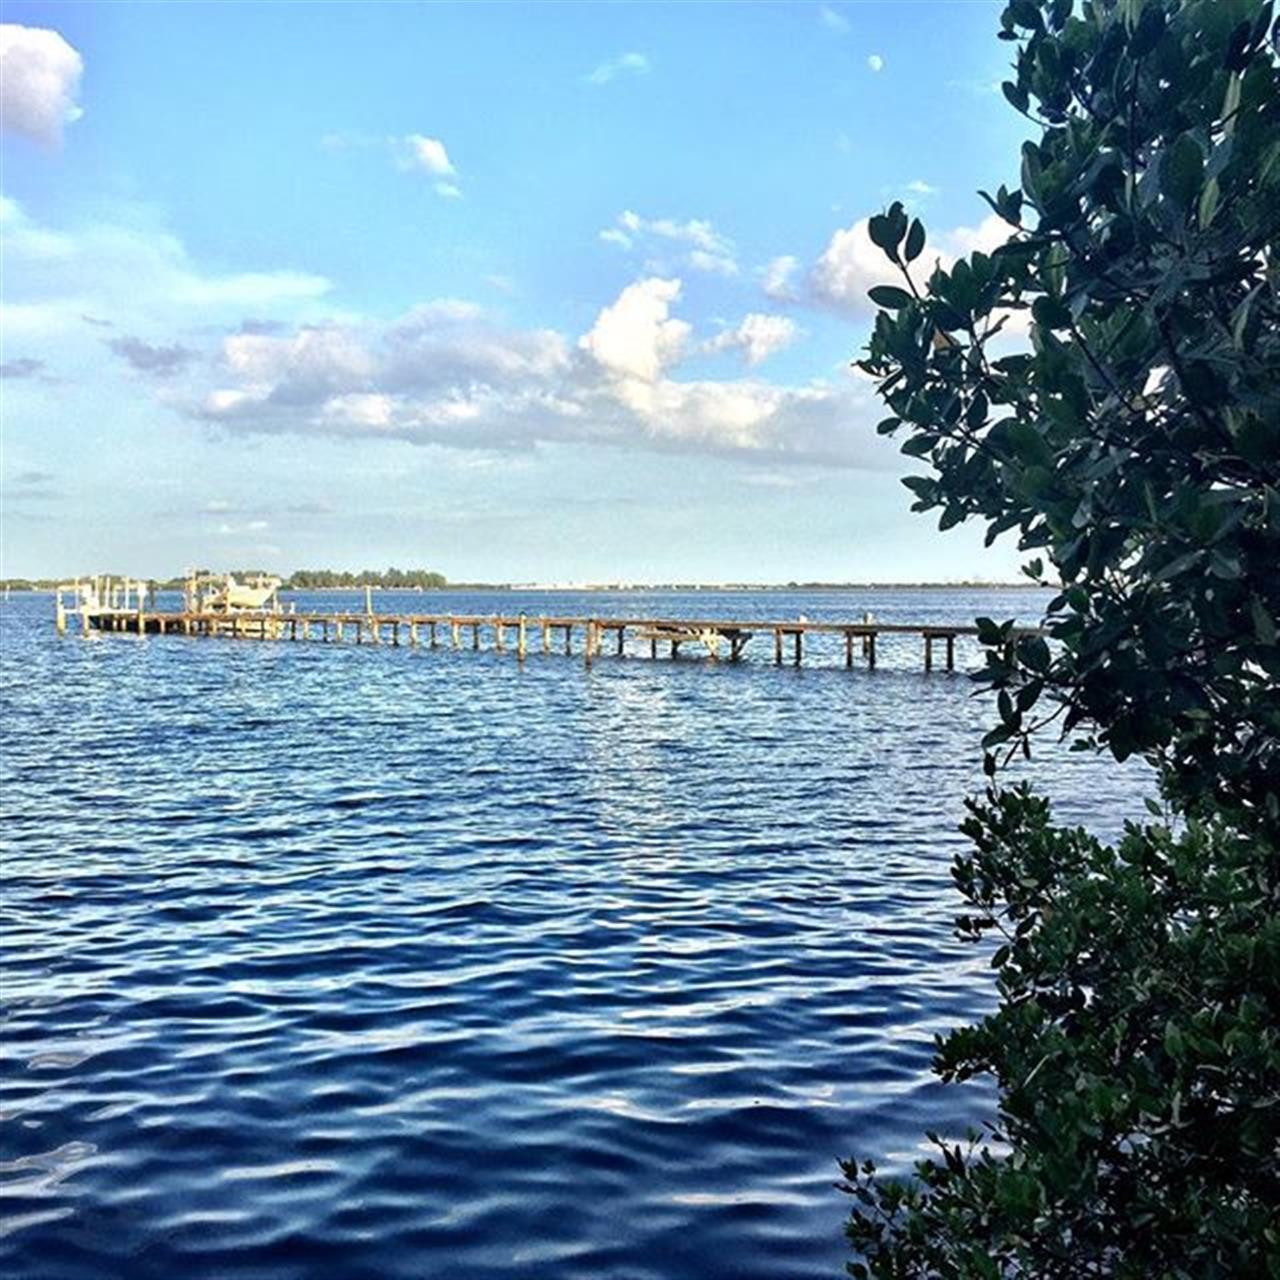 Let the relaxation begin. ? . . . #littlegasparillaisland #LGI #florida #boat #bocagrande #fl #vacation #leadingrelocal